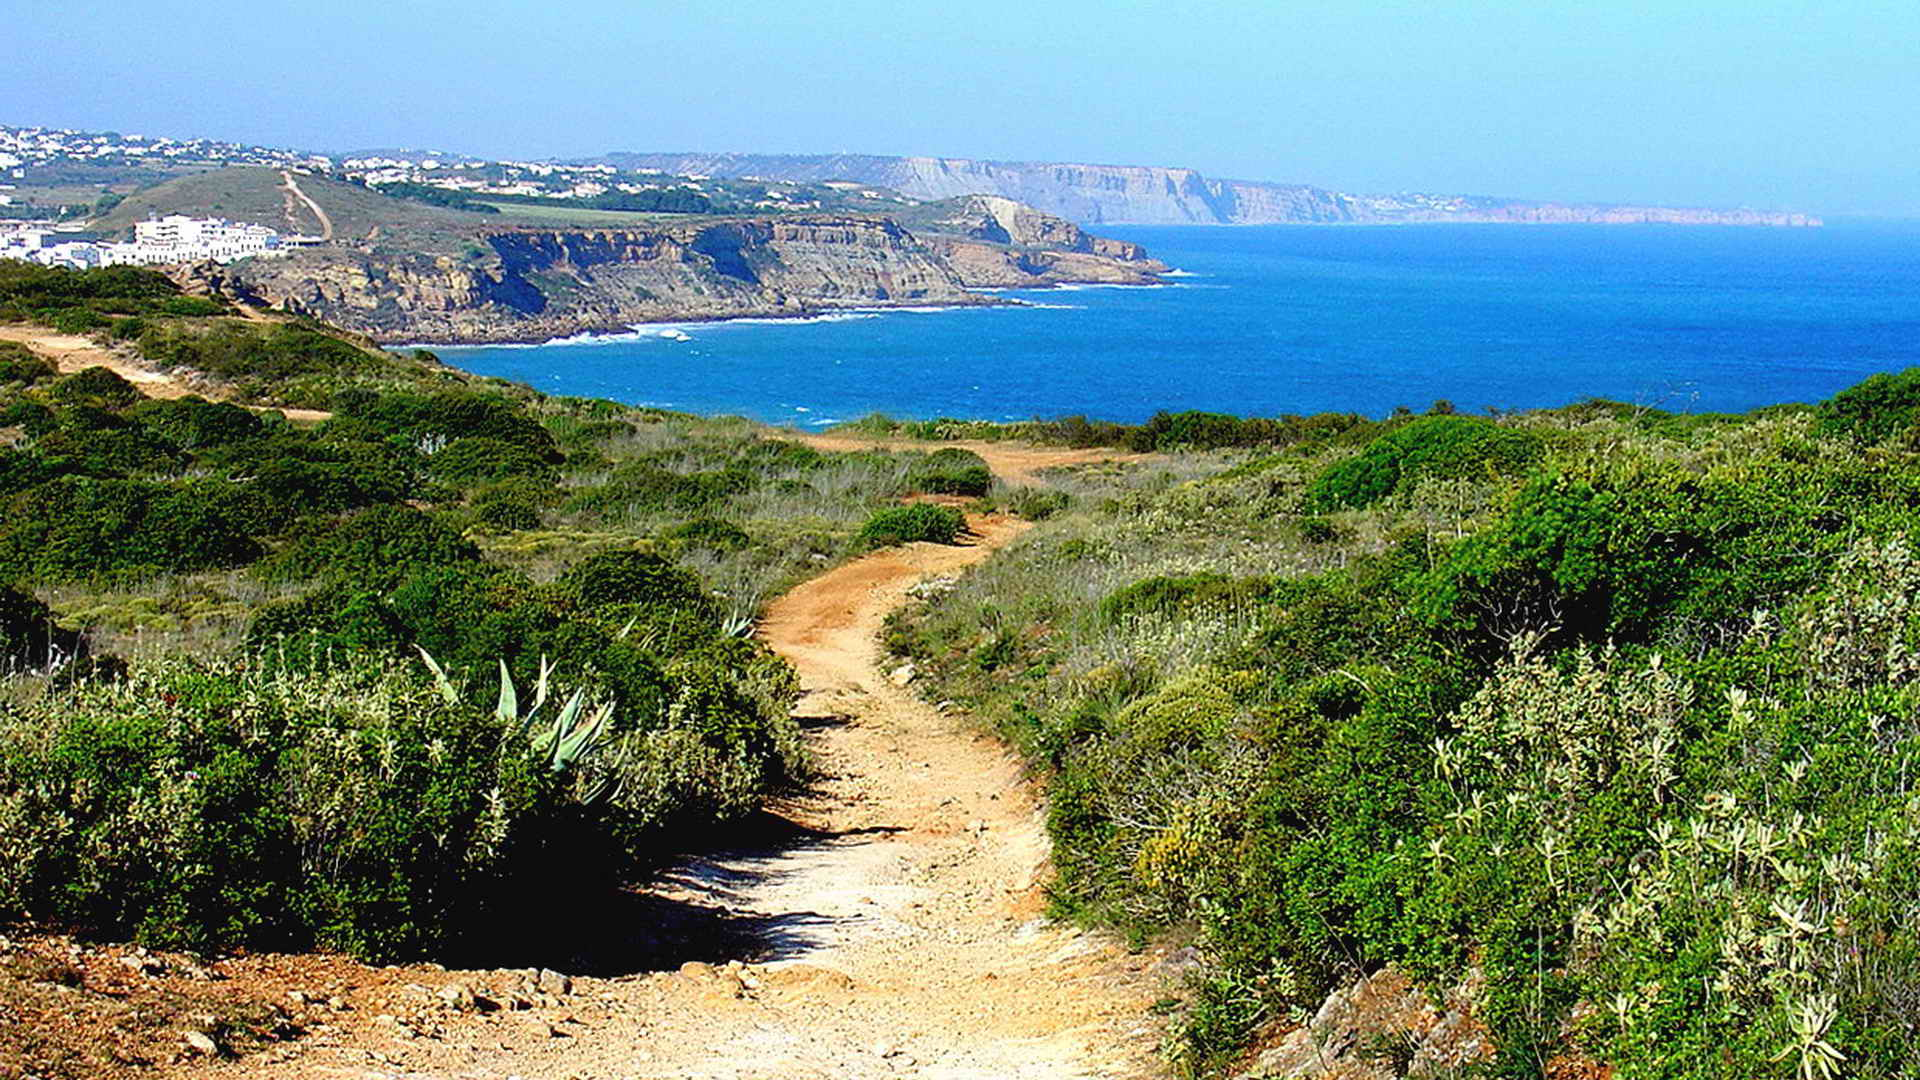 Self Guided Tour Portugal Bike Tours - Portugal vegetation map